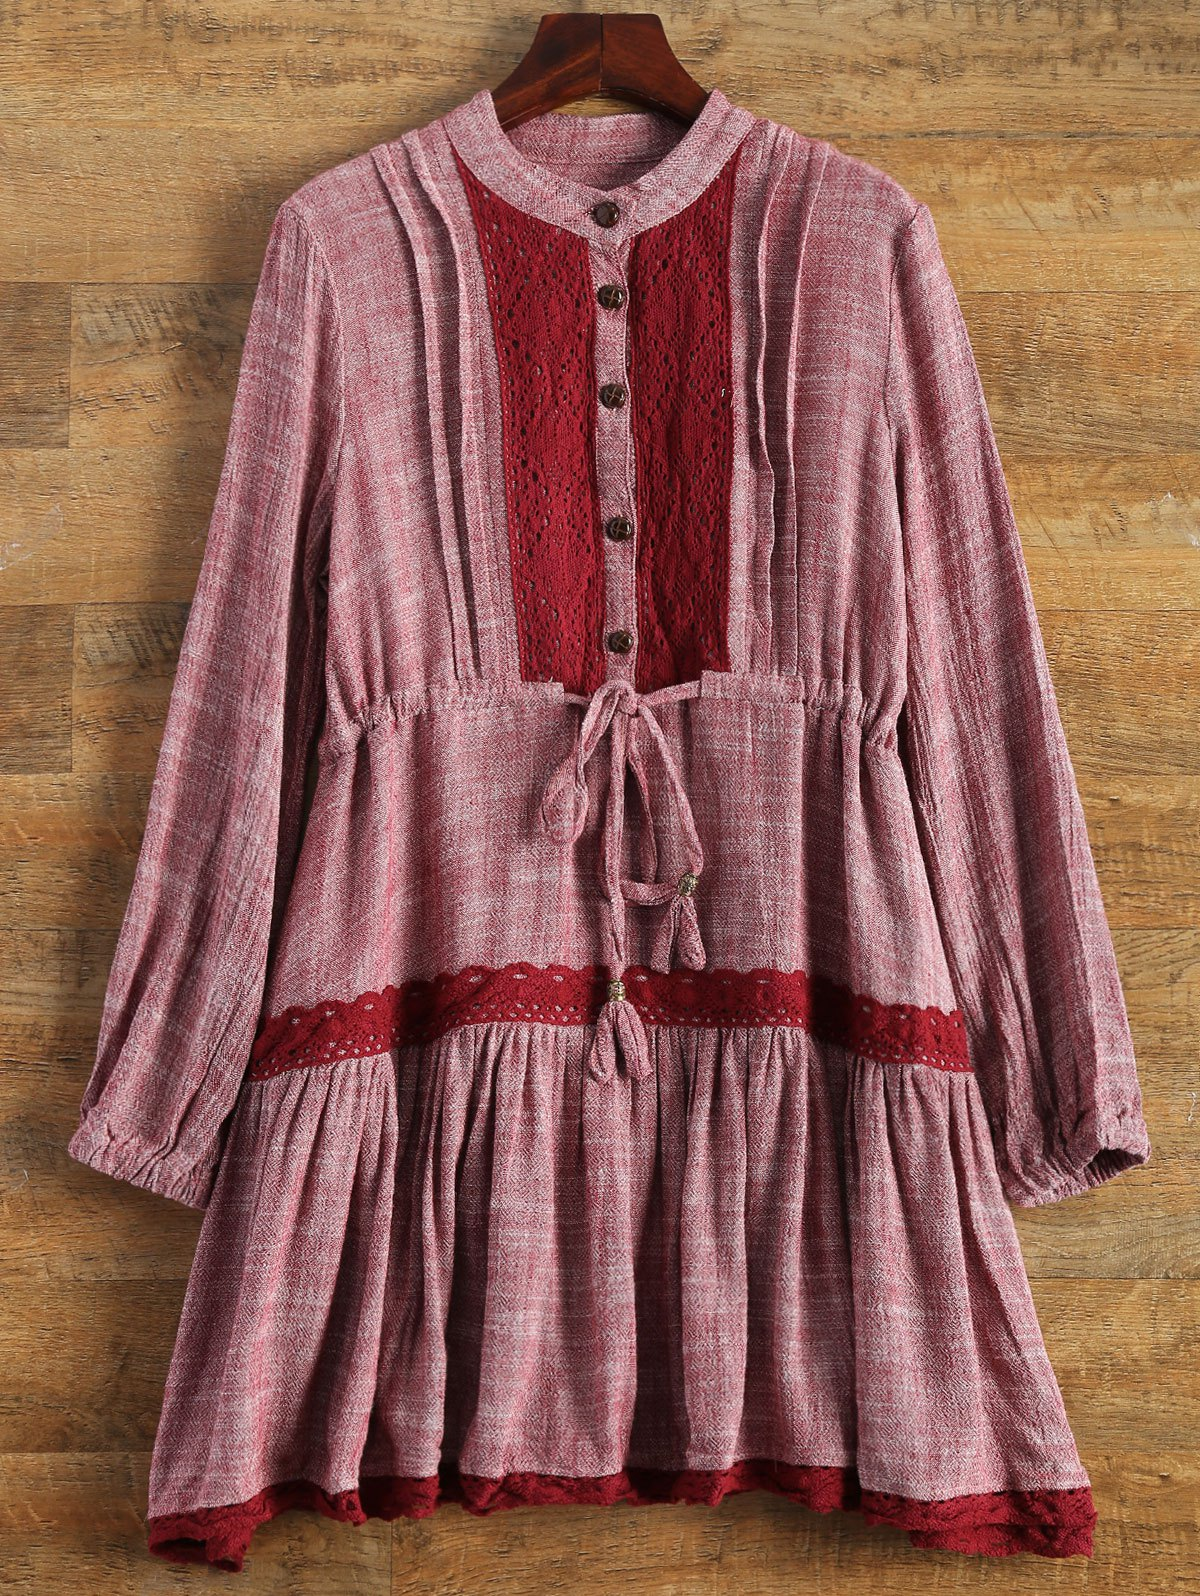 Long Sleeve Lace Bib Smock Dress